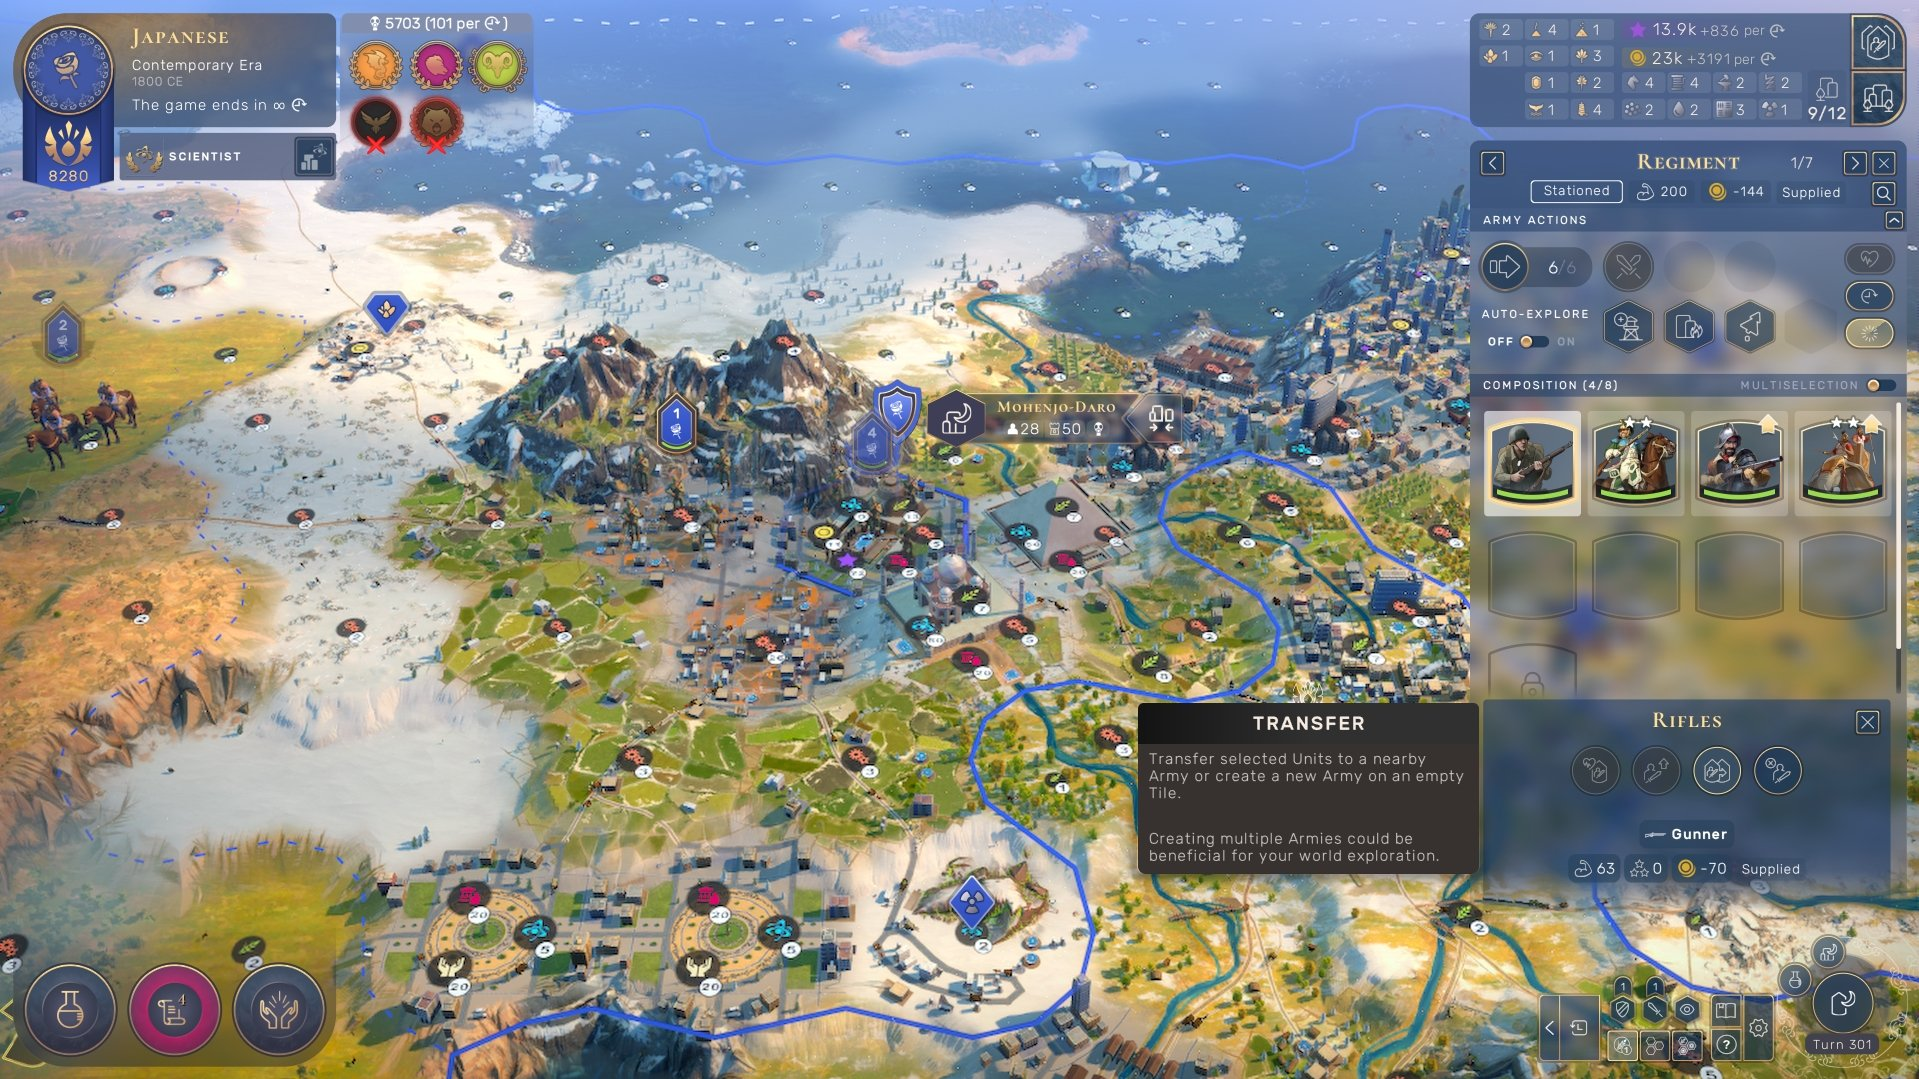 Humankind - How to Split Armies Screenshot